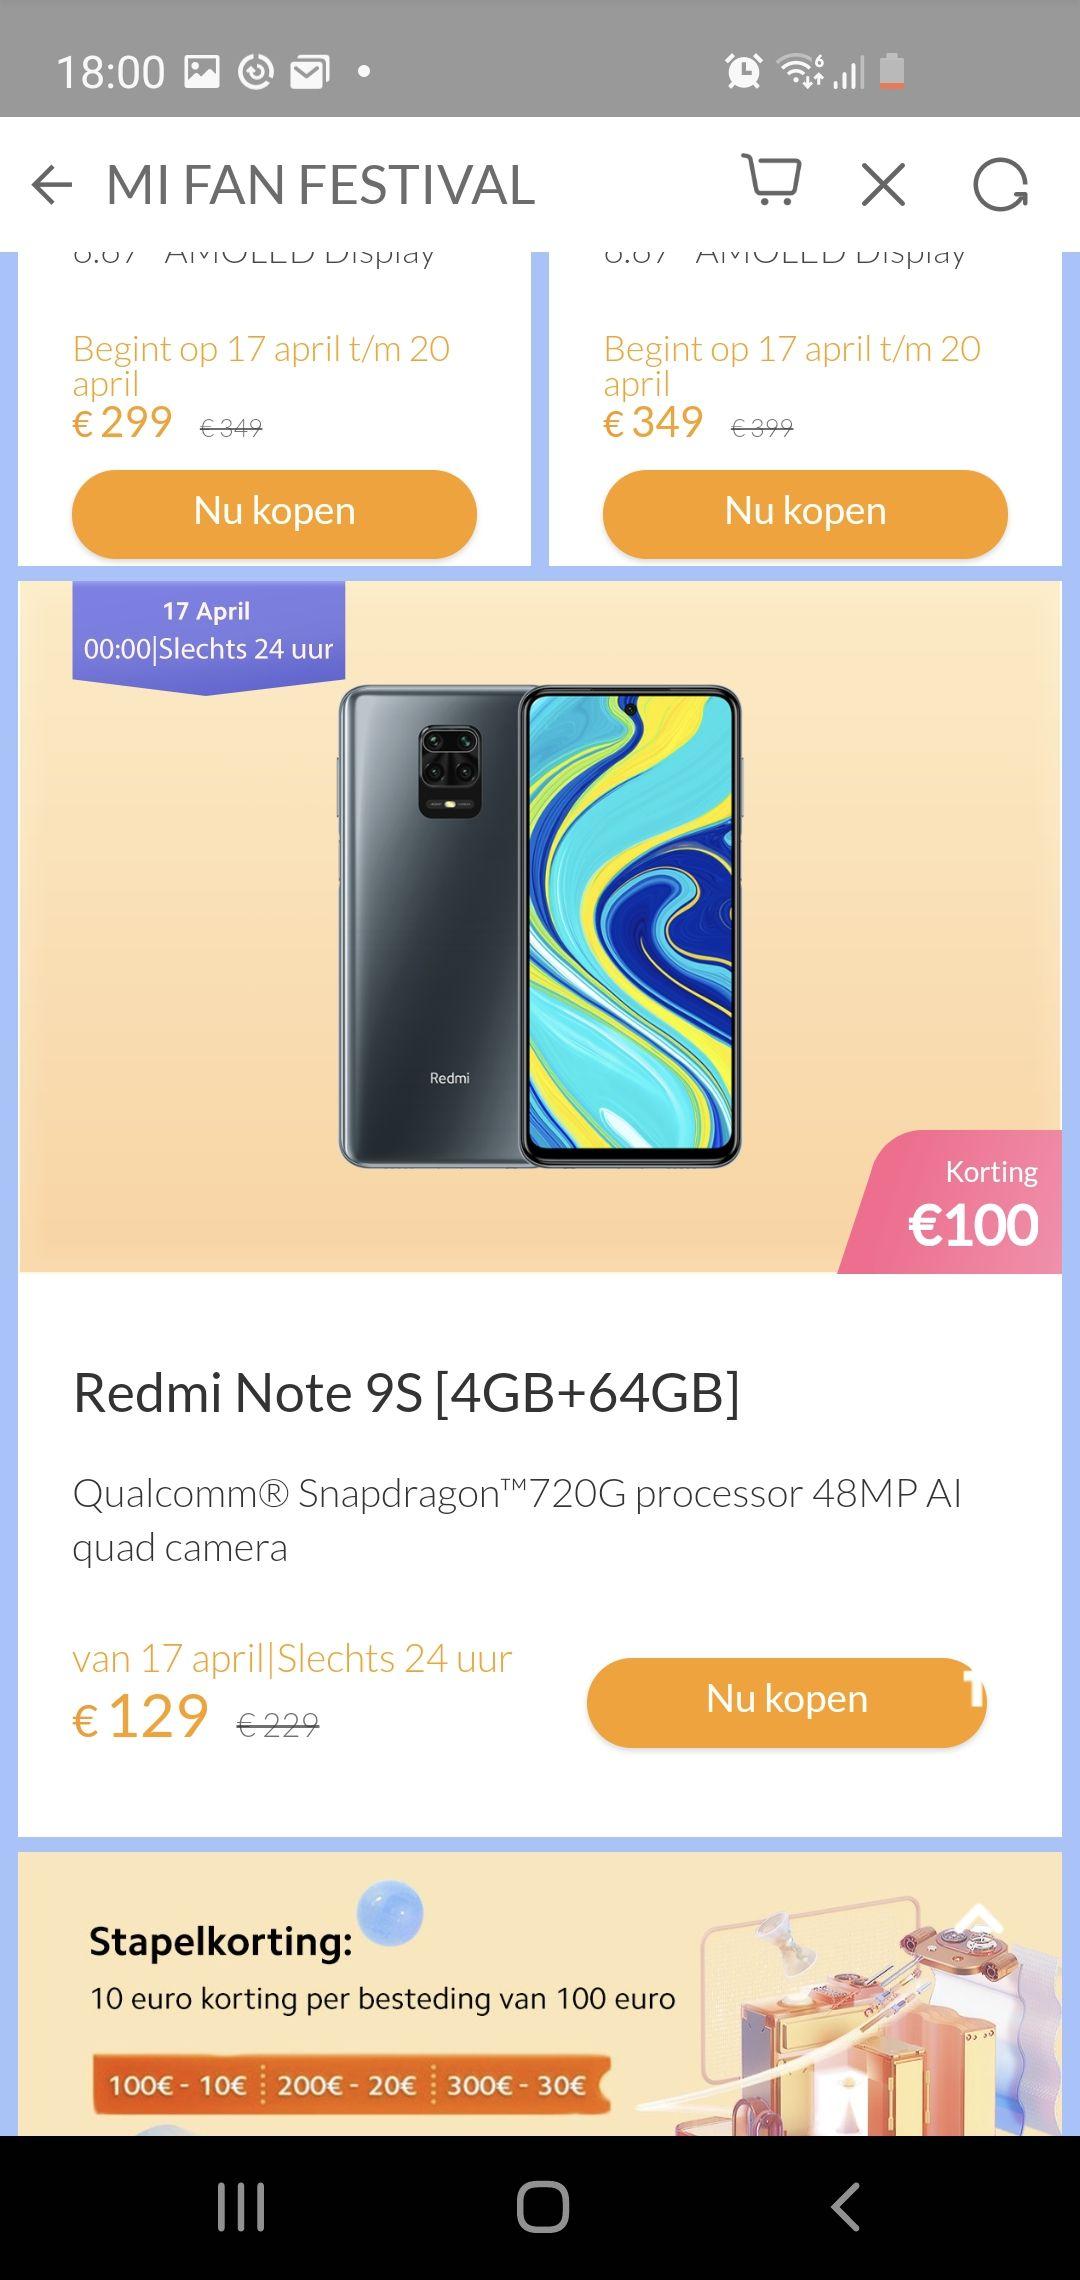 Xiaomi note 9s 4gb+64gb